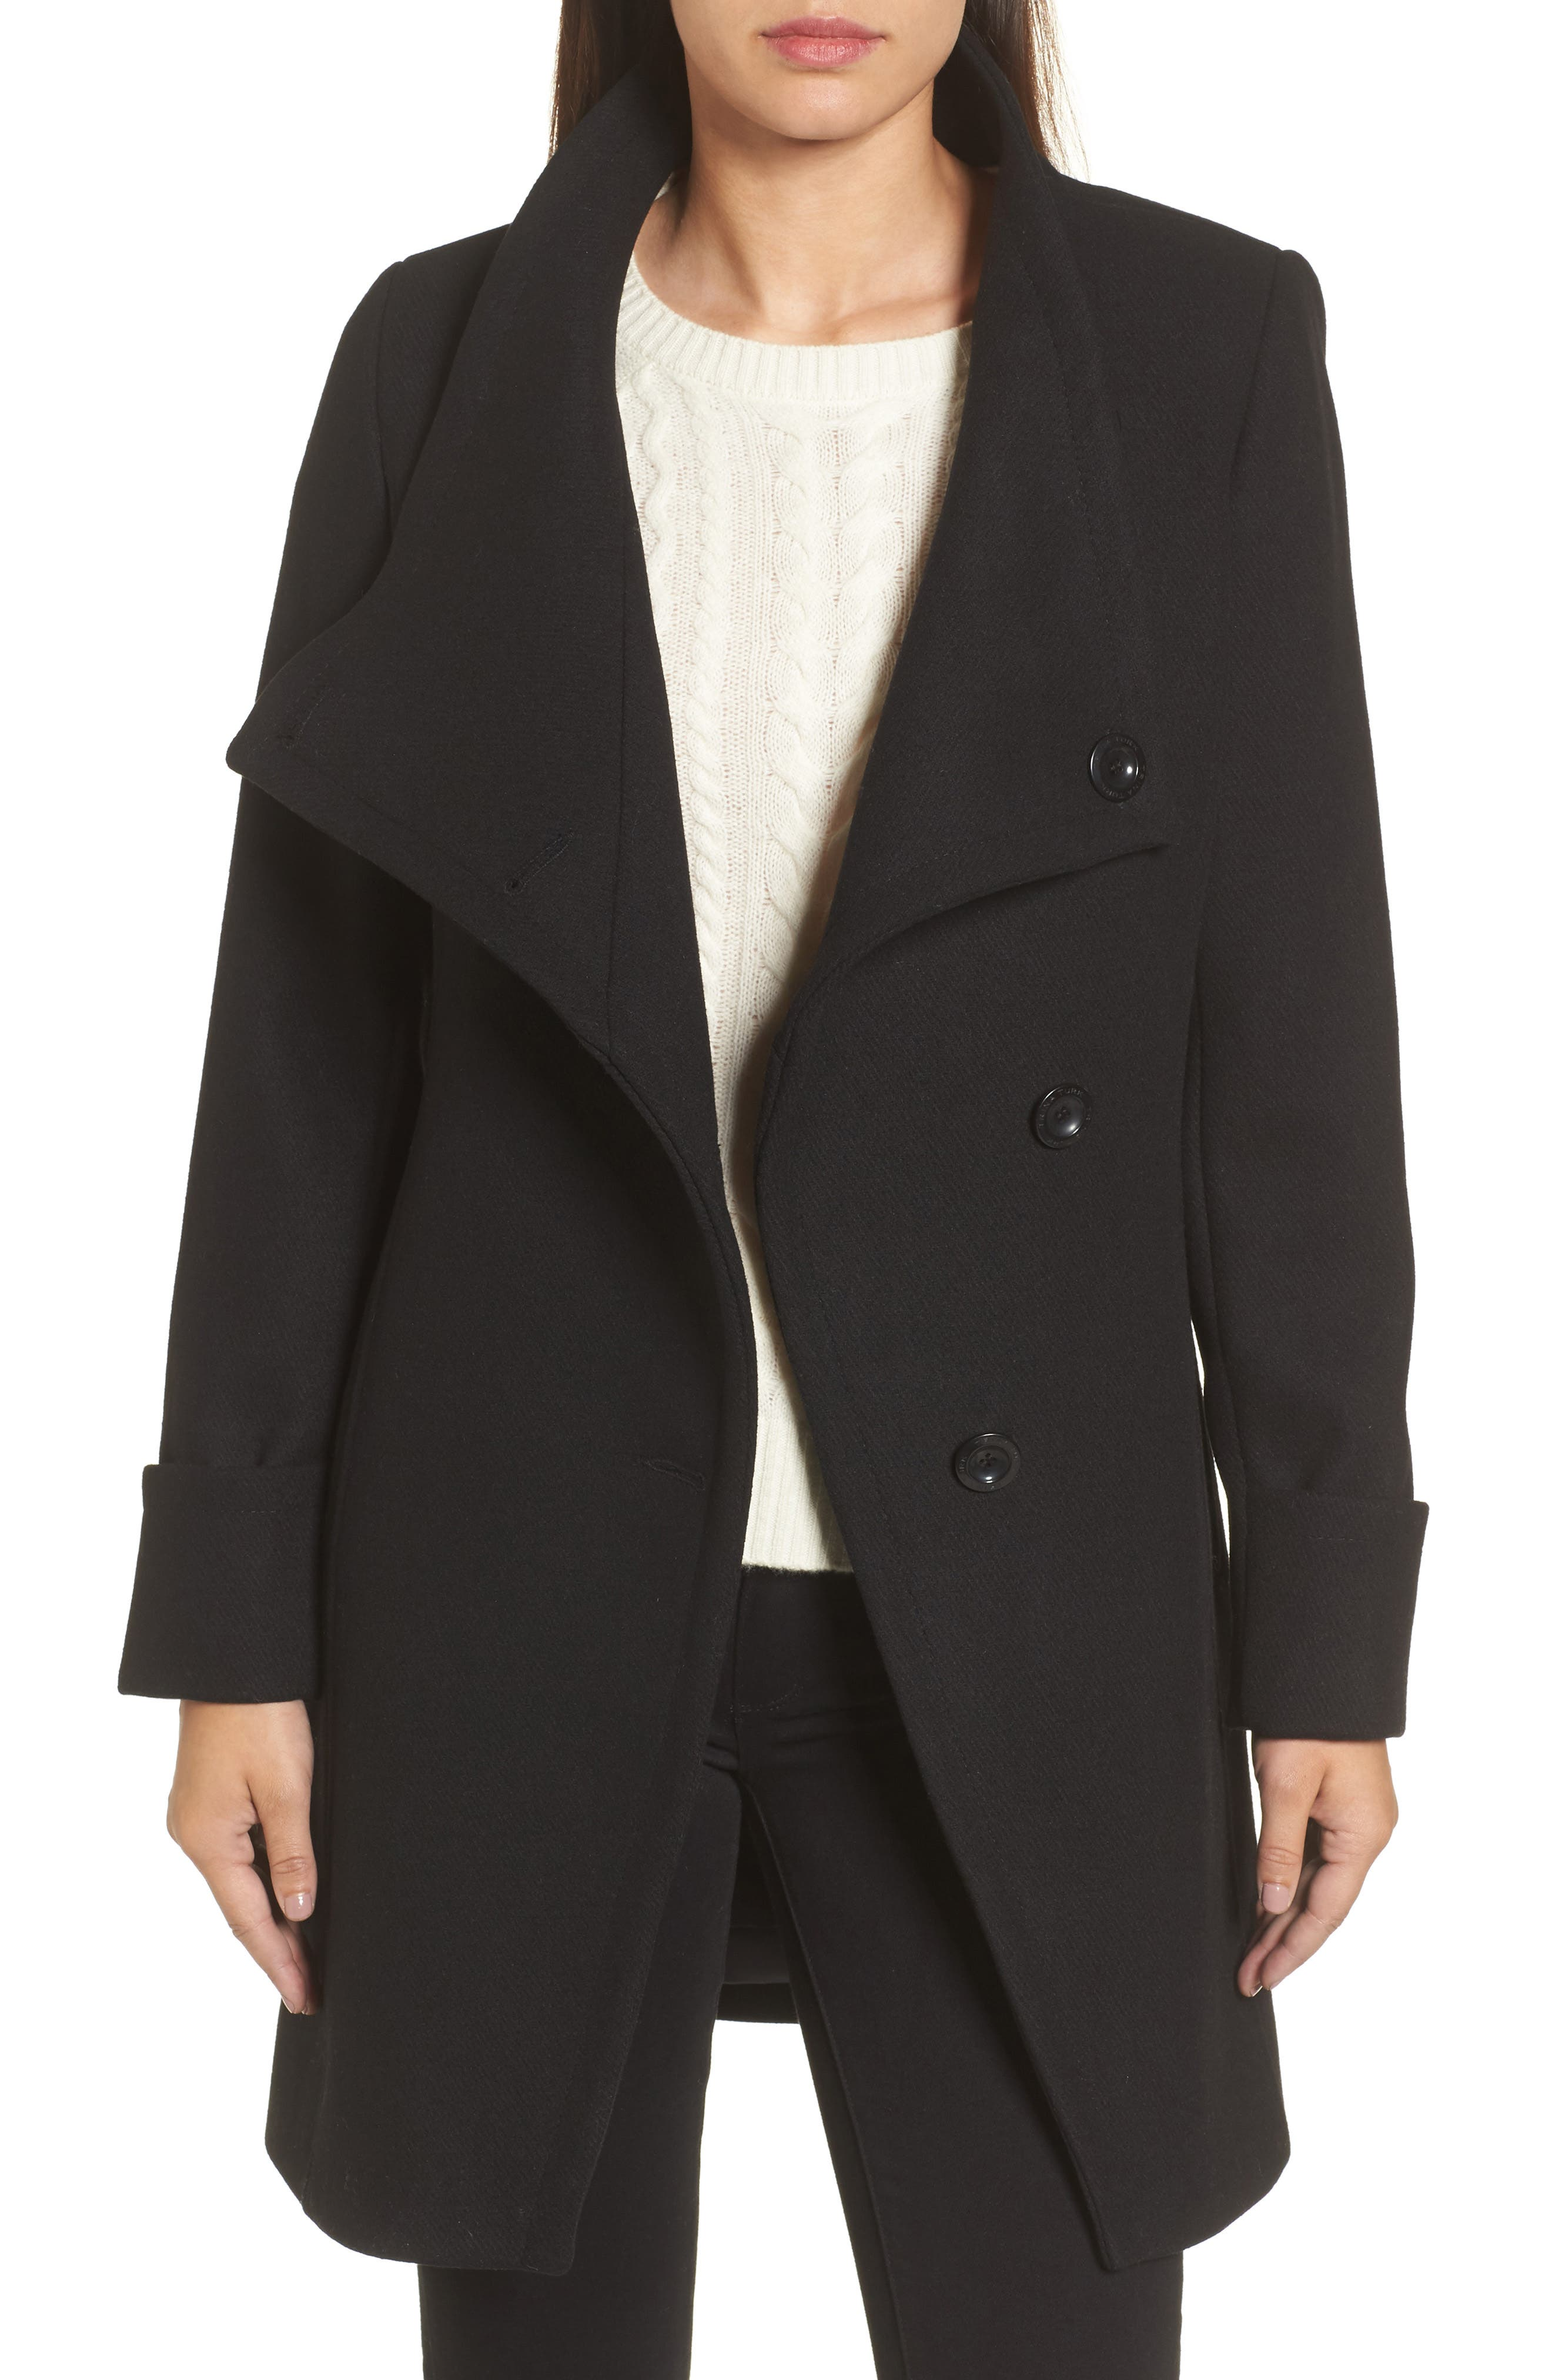 Alternate Image 1 Selected - Trina Turk Fiona Double Breasted Coat